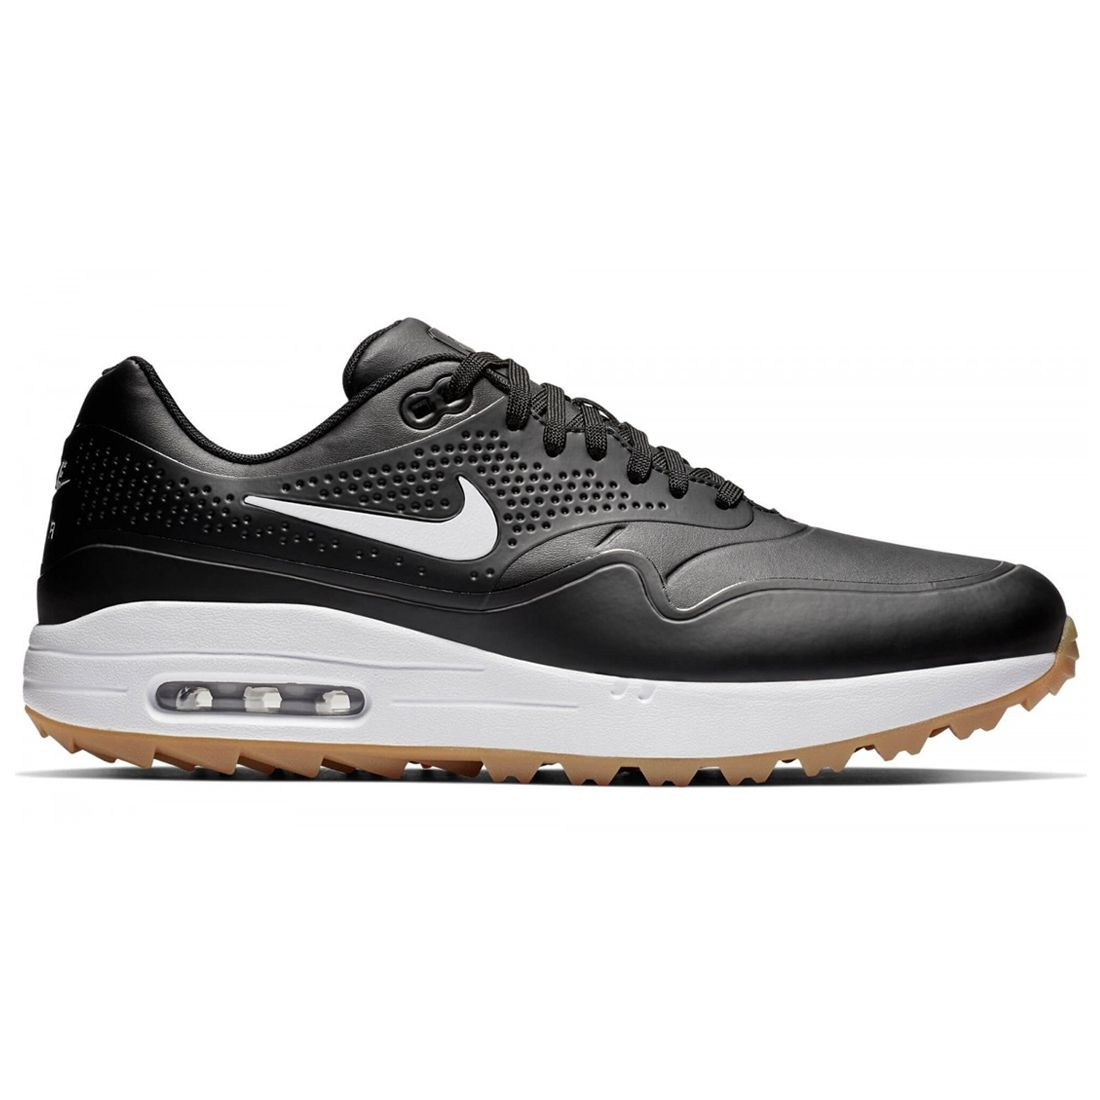 Buy Nike Air Max 1 G Golf Shoes Black